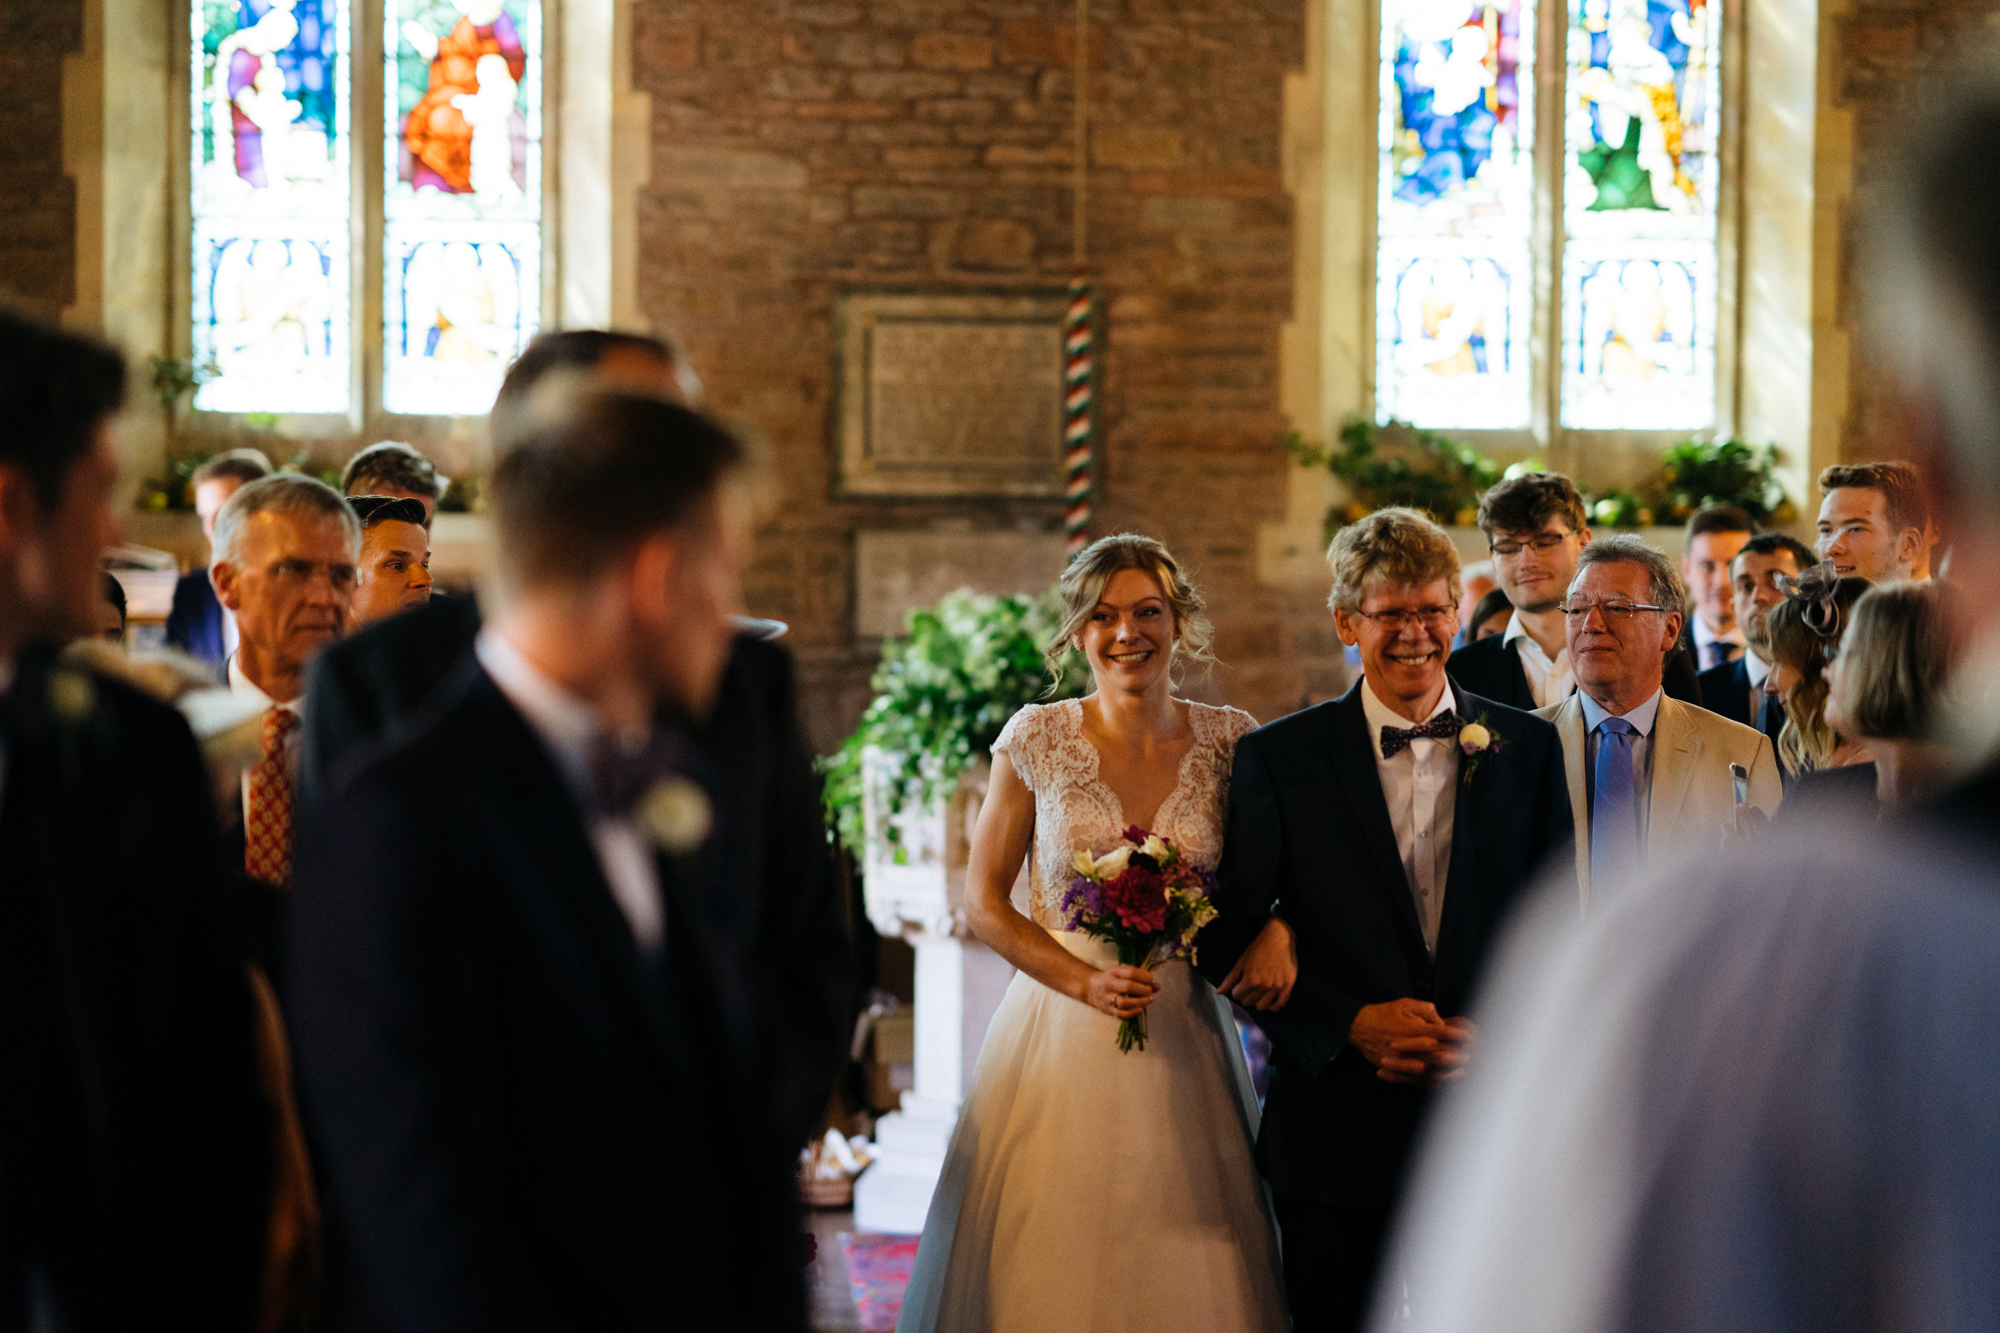 2019-09-21-Will&Ruth-Home-Wedding-121.jpg